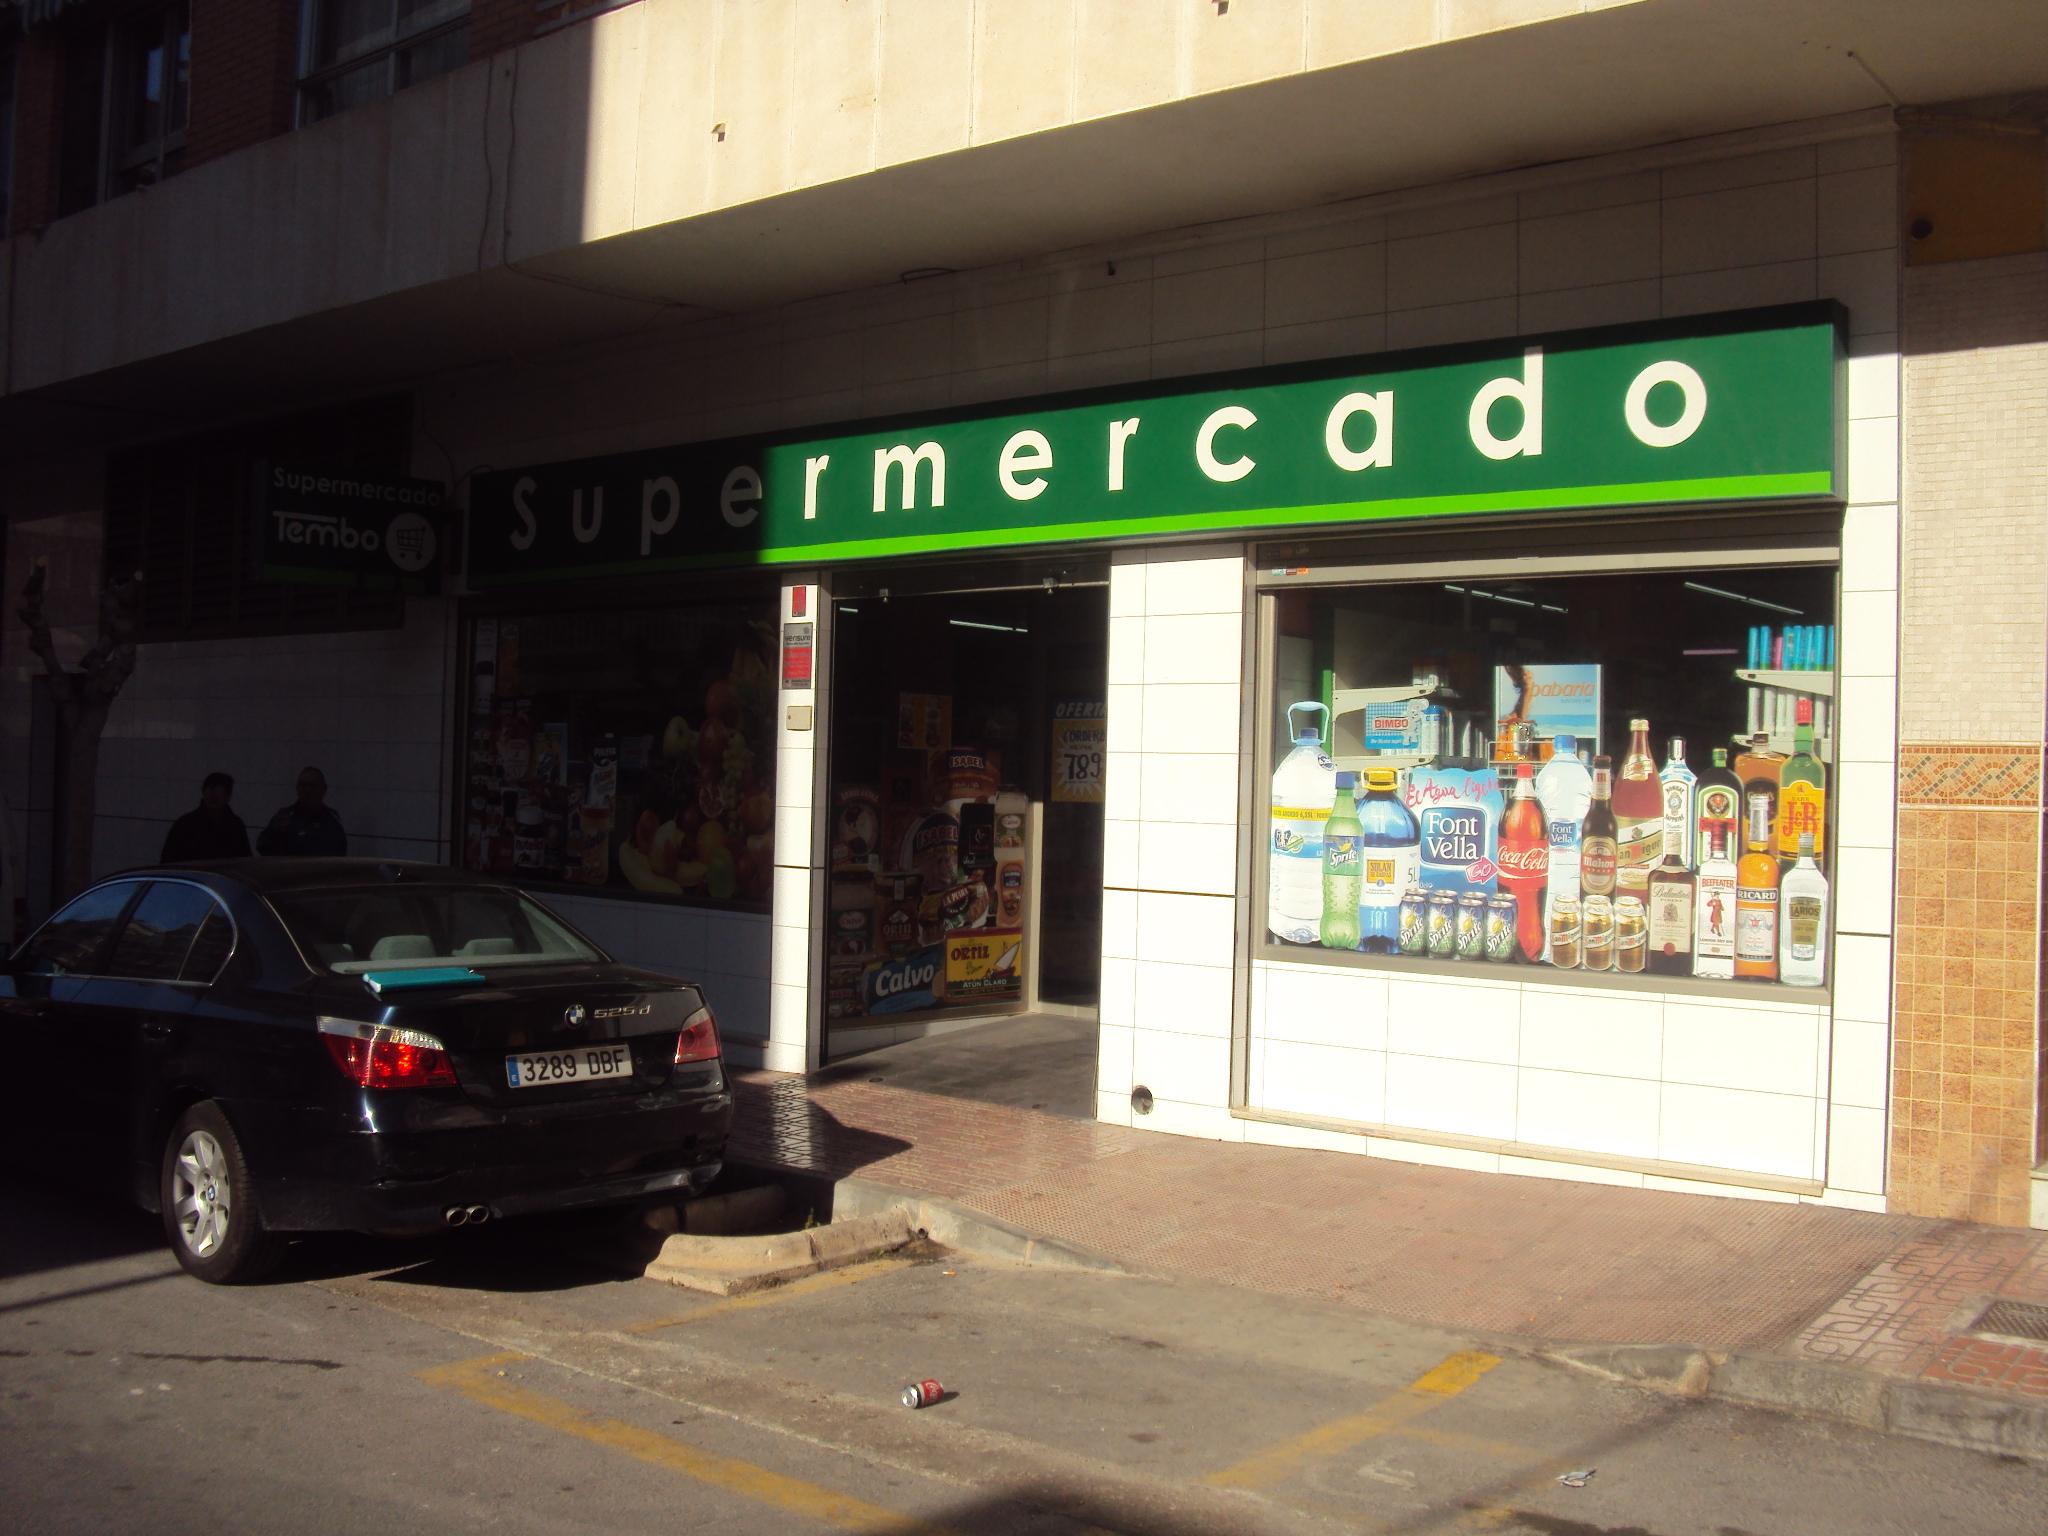 GRAN SUPERMERCADO TEMBO